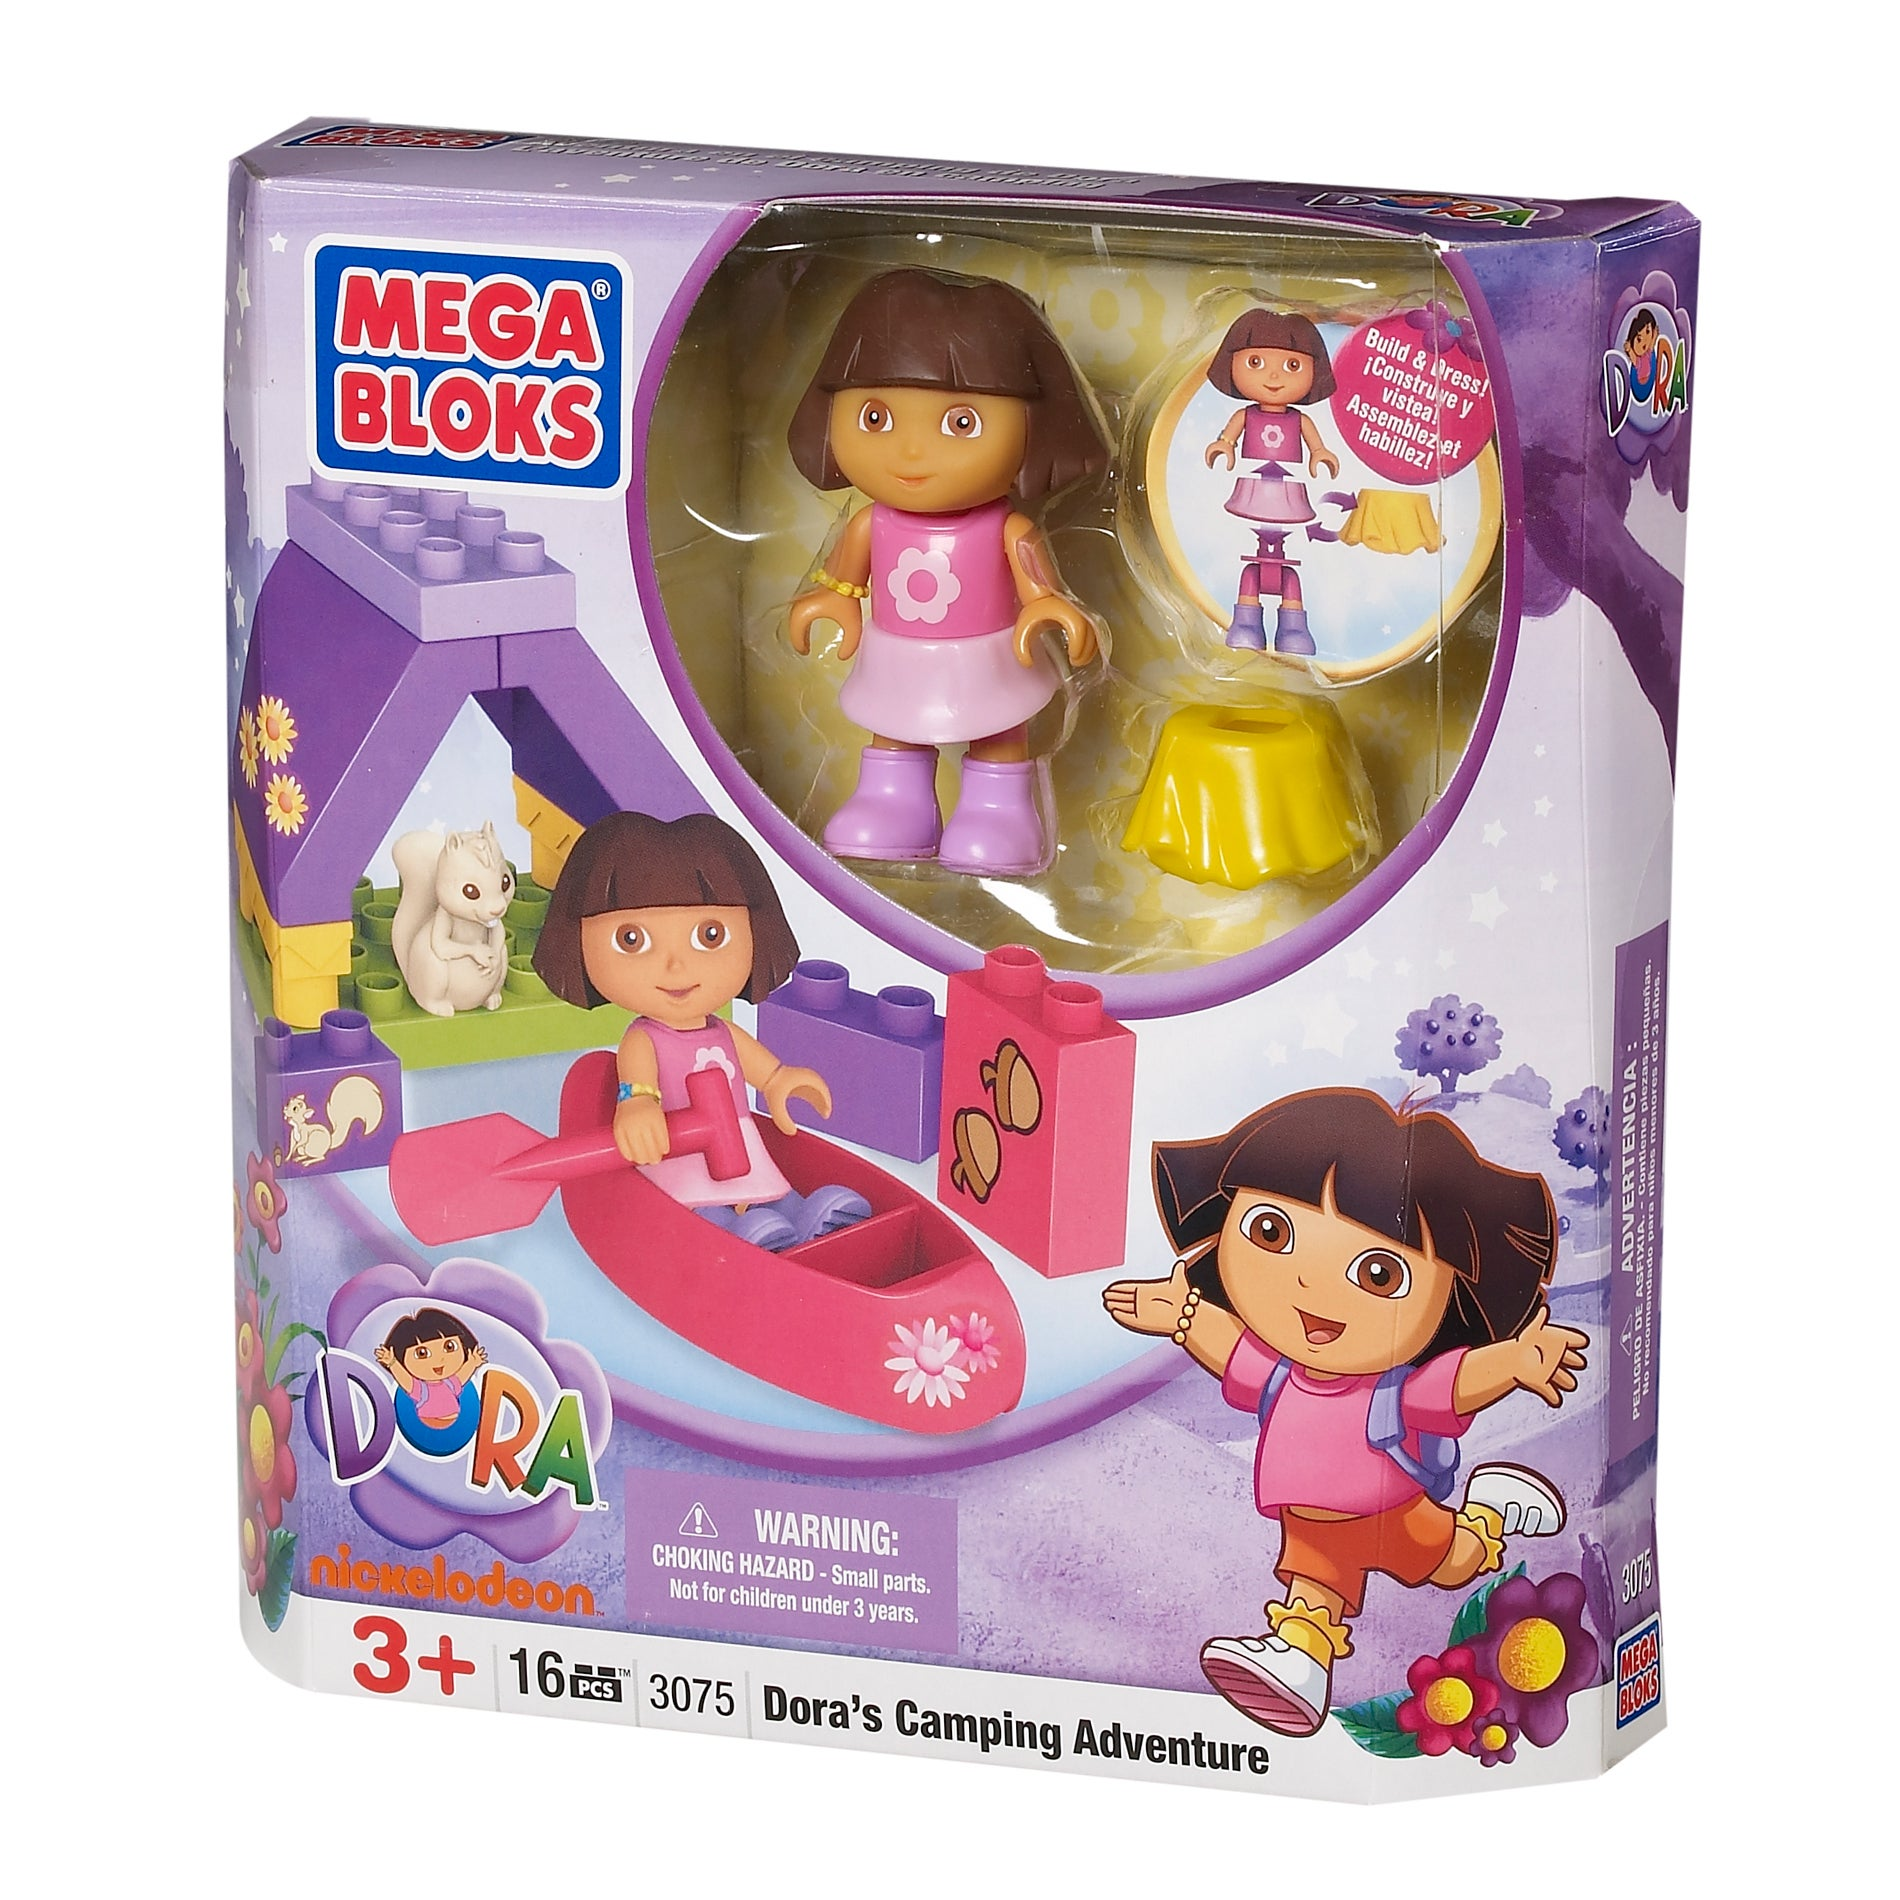 Mega Bloks Dora The Explorer Camping Adventure Play Set